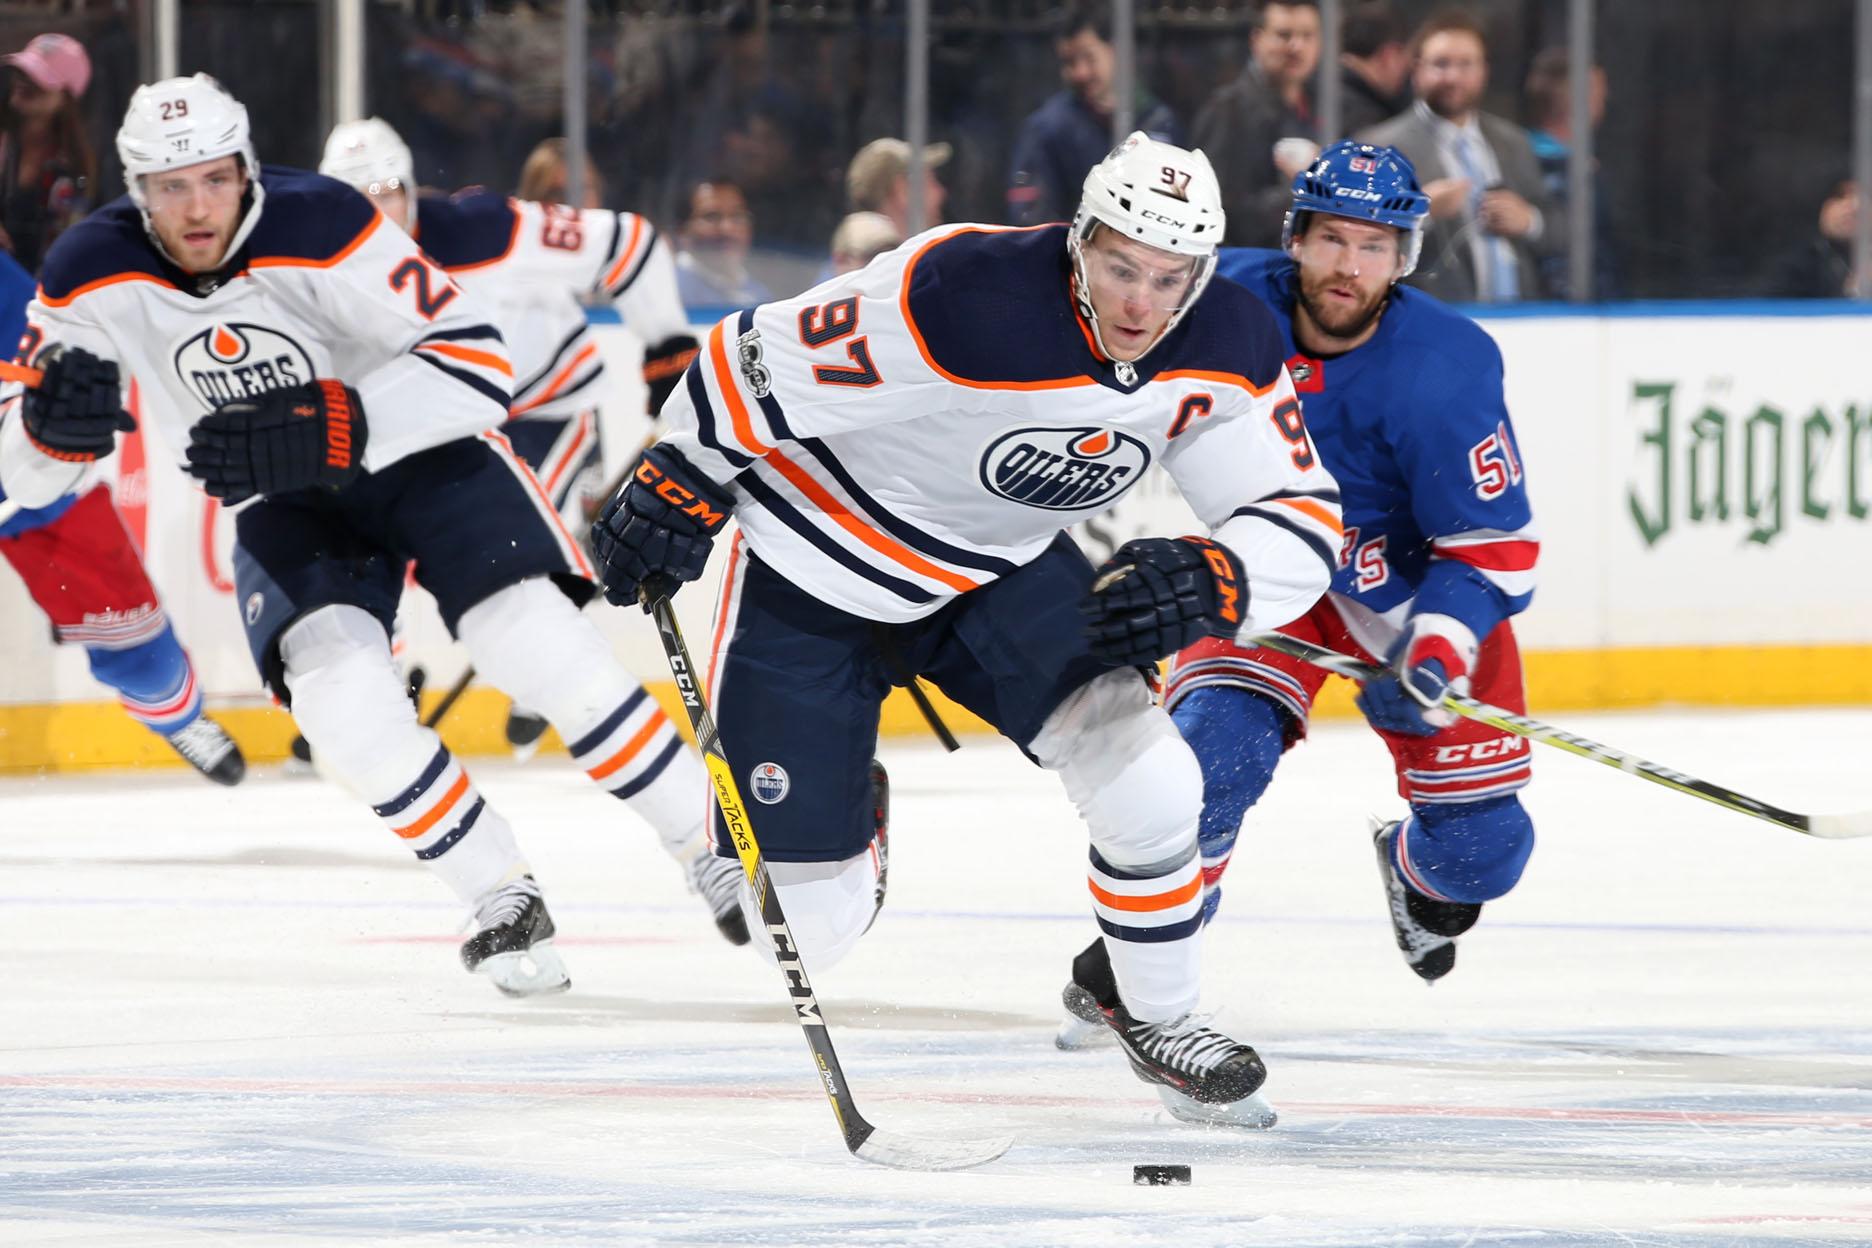 Rangers defeat Oilers as Alexander Georgiev earns first NHL win